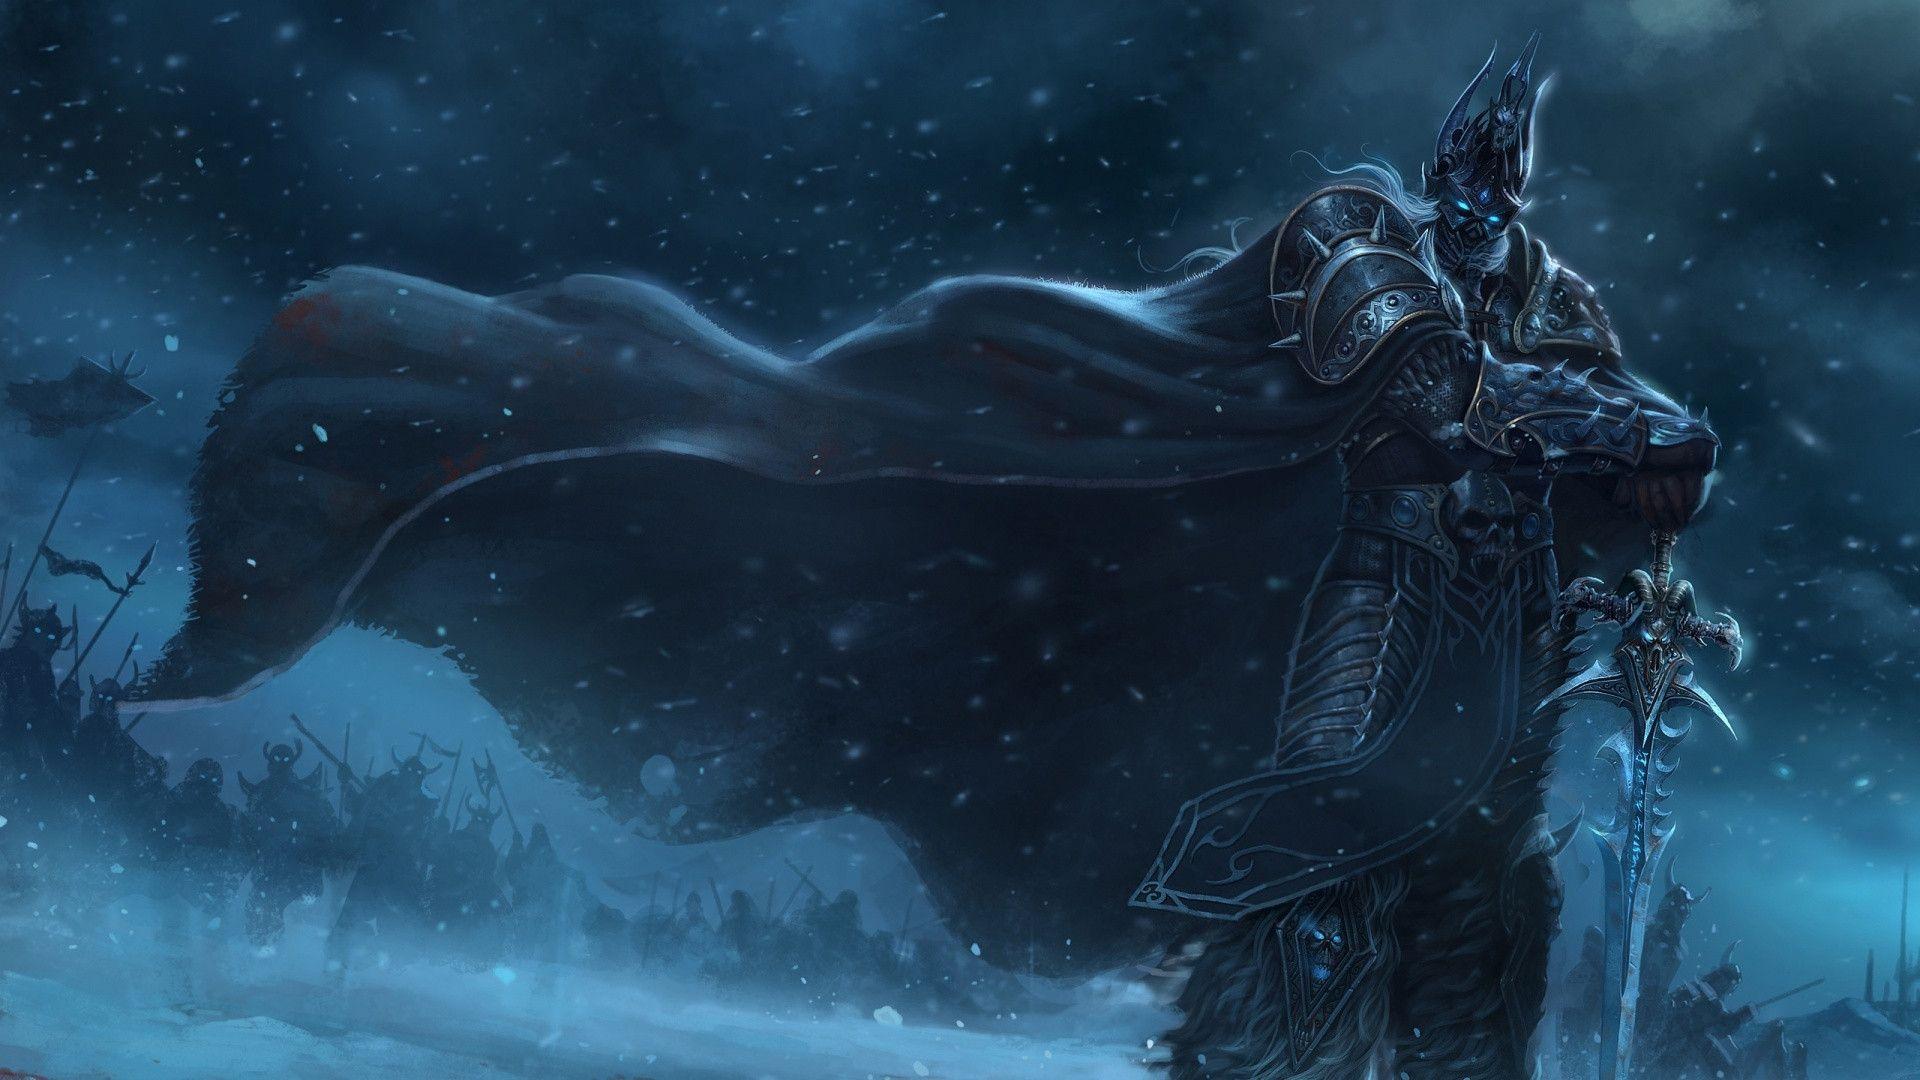 Destiny-Taken-King-Warlock-wallpaper-wp3804529